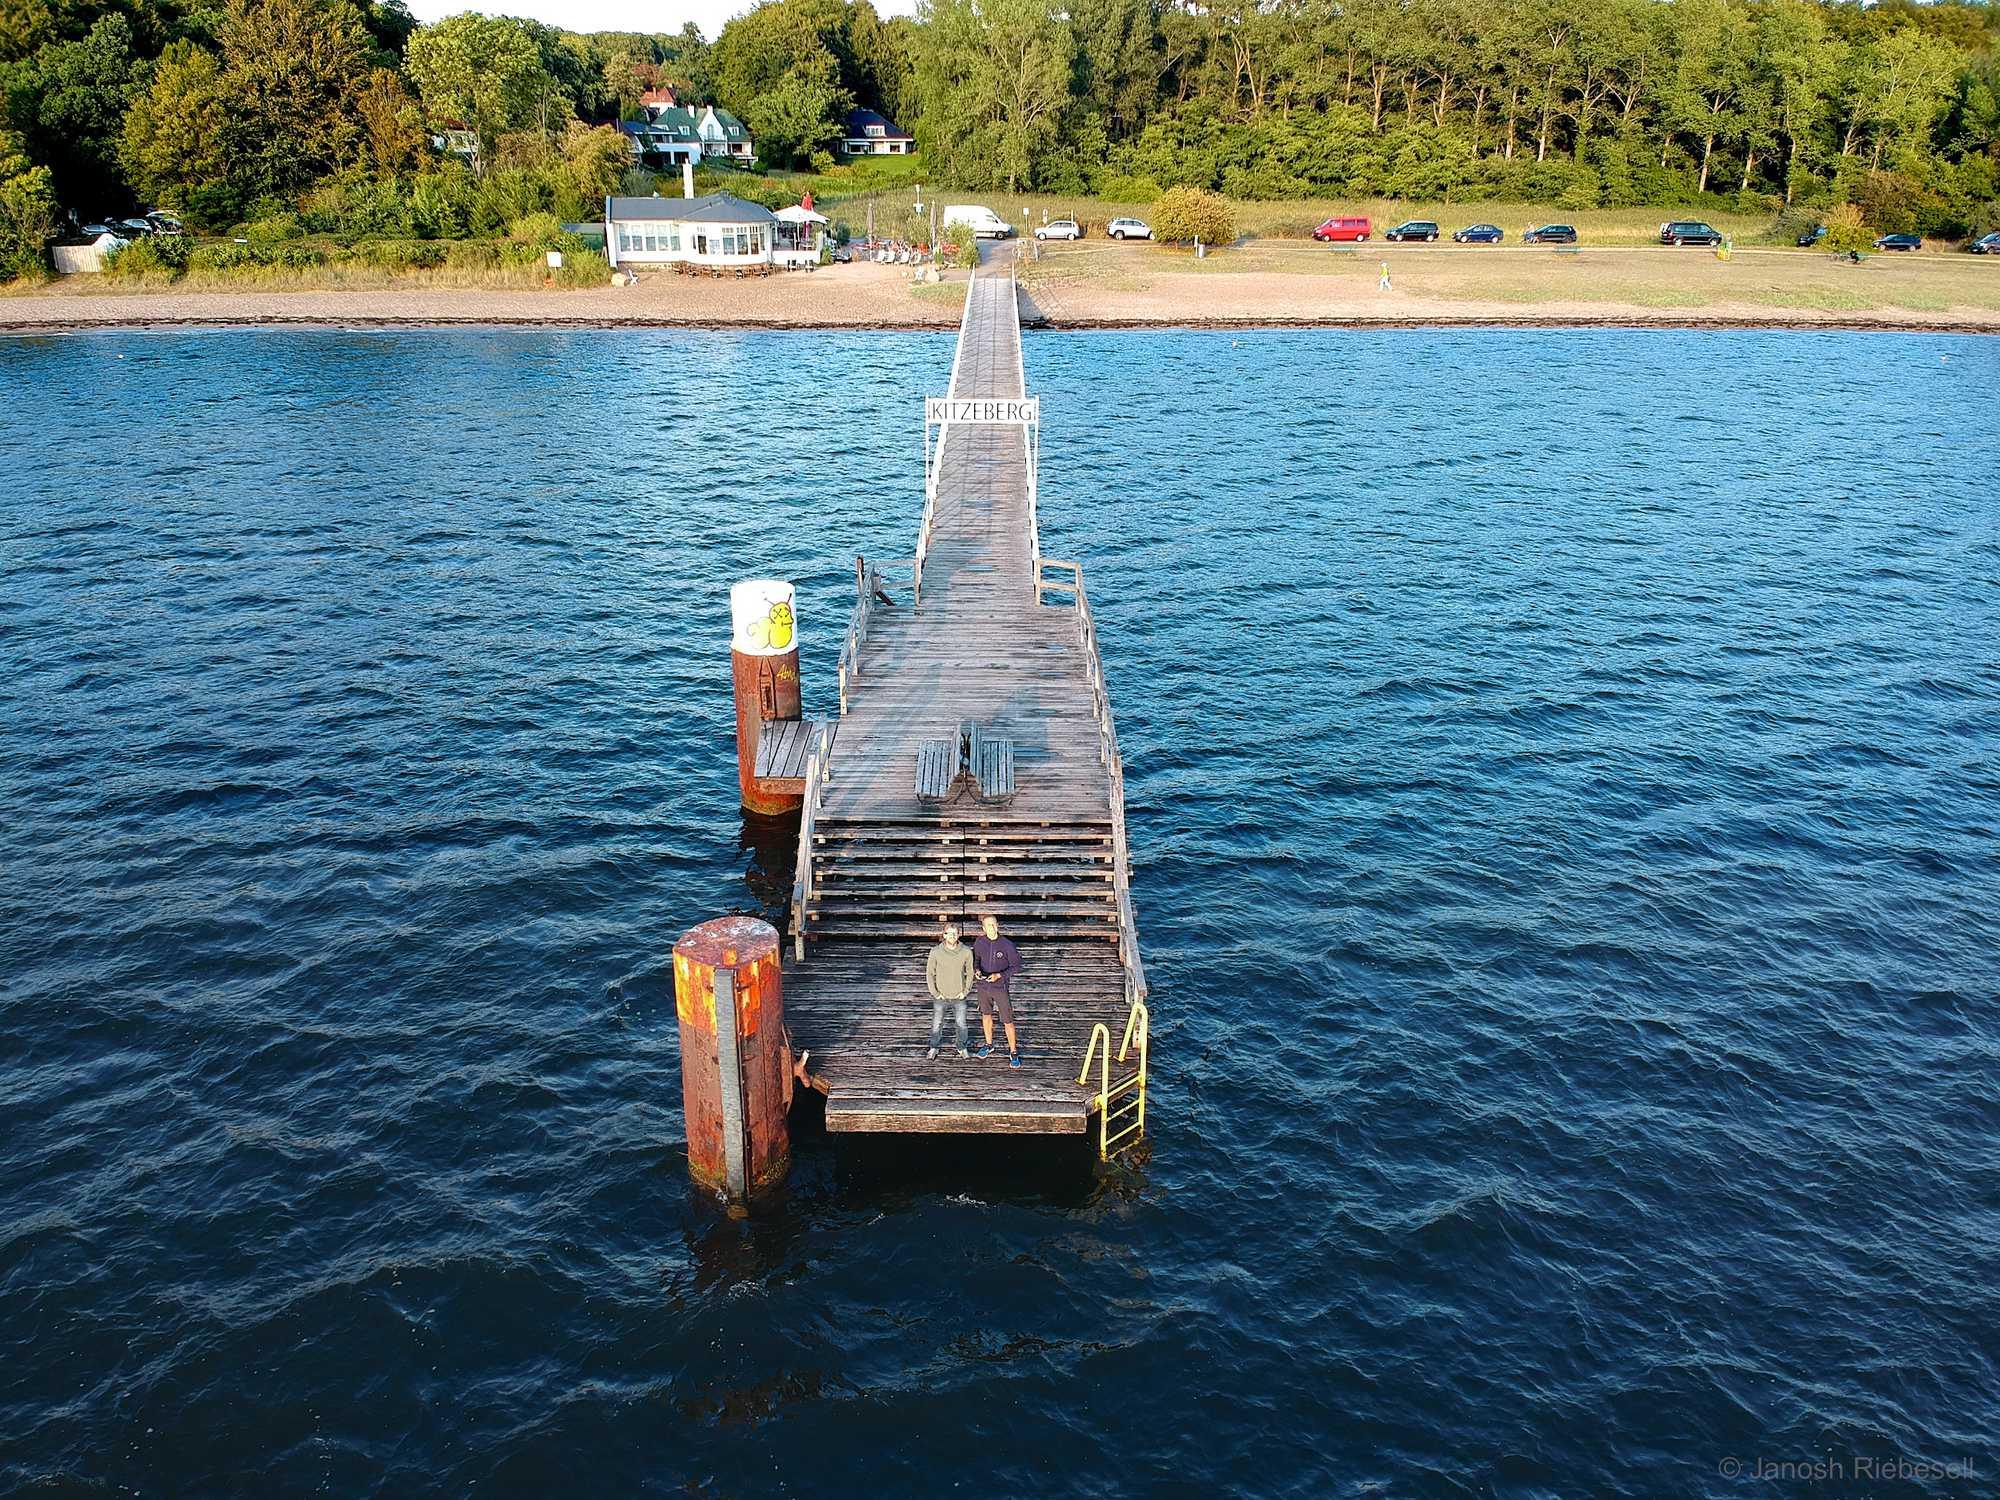 Drone Kitzeberg Pier